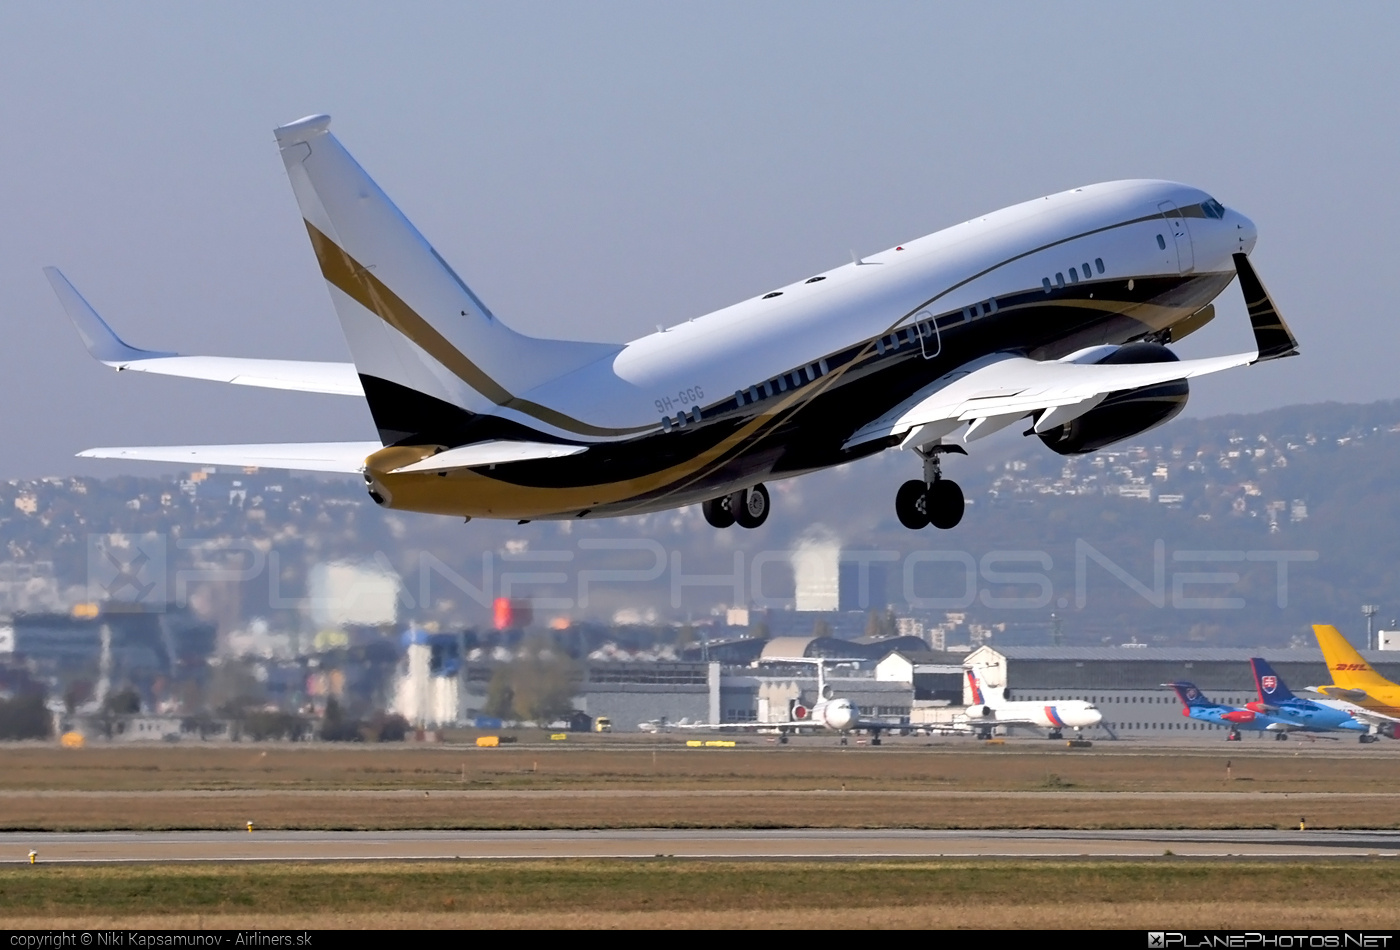 Boeing 737-700 BBJ - 9H-GGG operated by Maleth-Aero #b737 #b737bbj #bbj #boeing #boeing737 #boeingbusinessjet